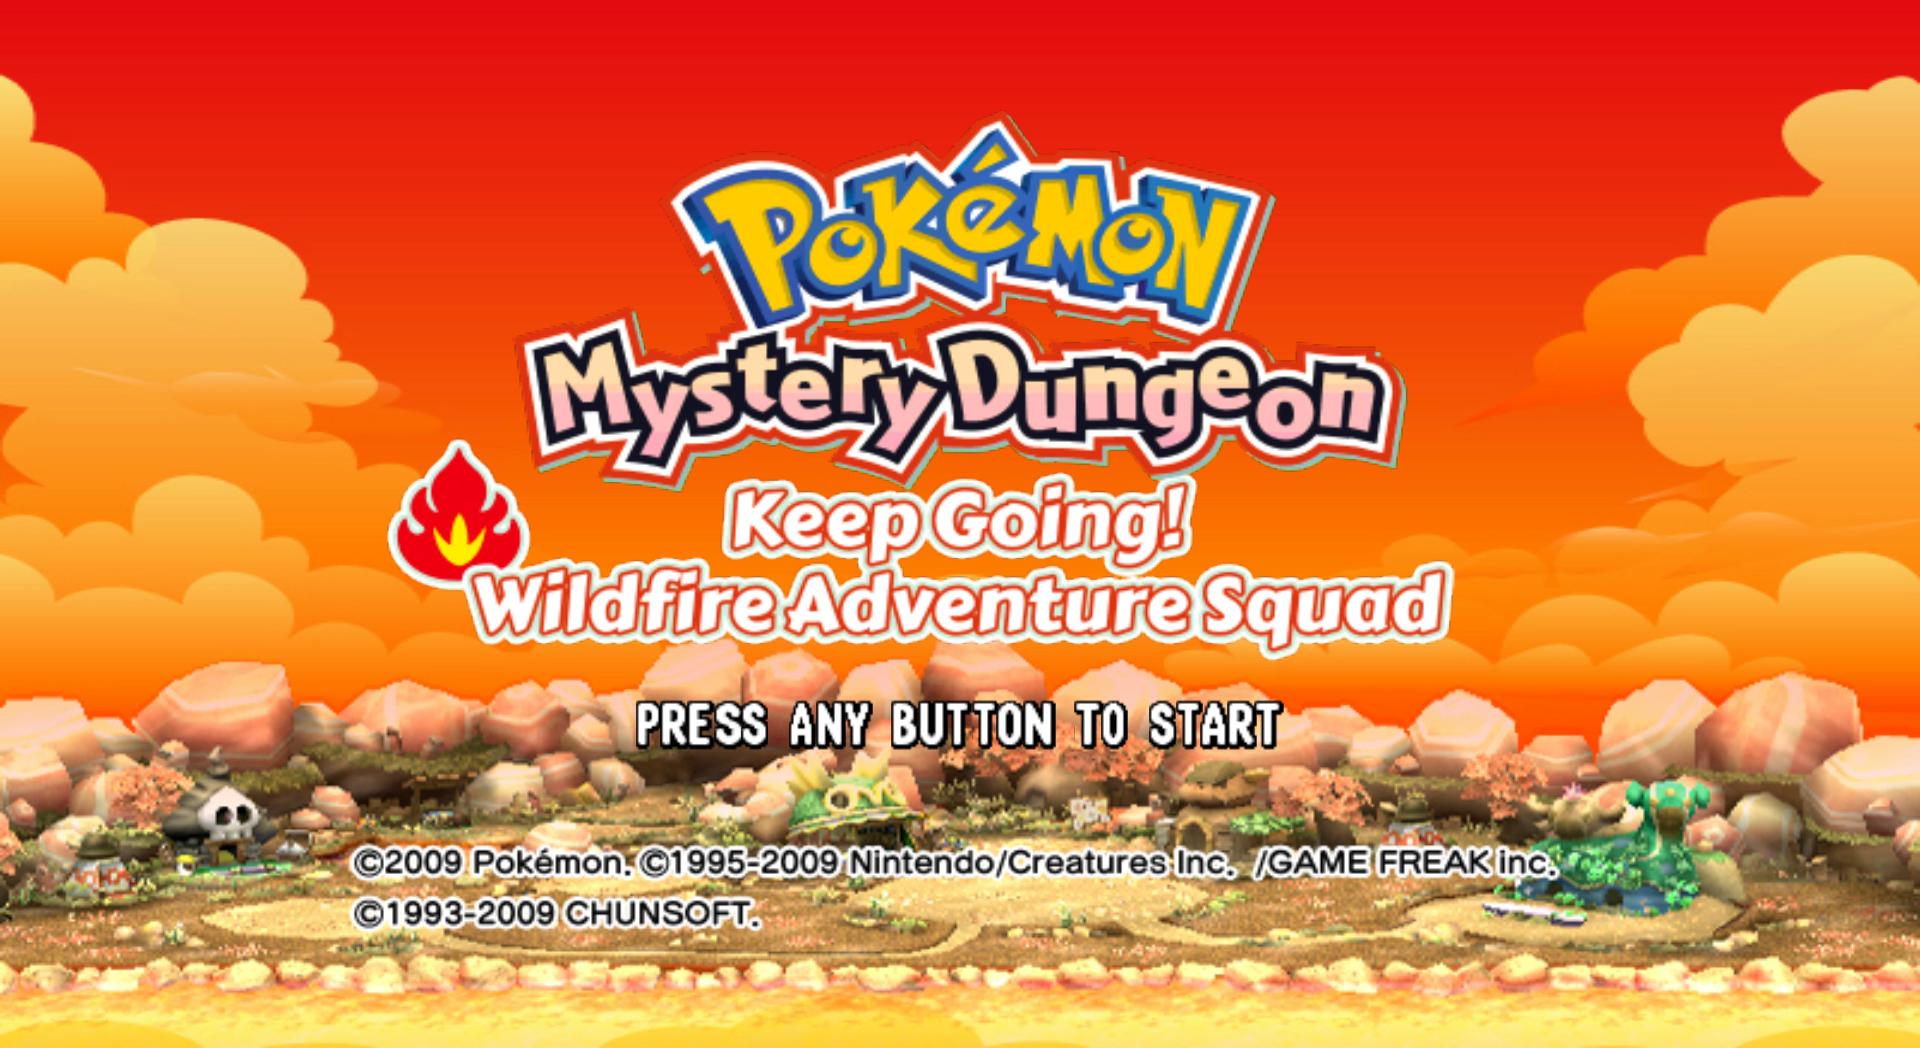 Descargar el ROM de Pokemon Fushigi no Dungeon - Susume! Honou no Boukendan